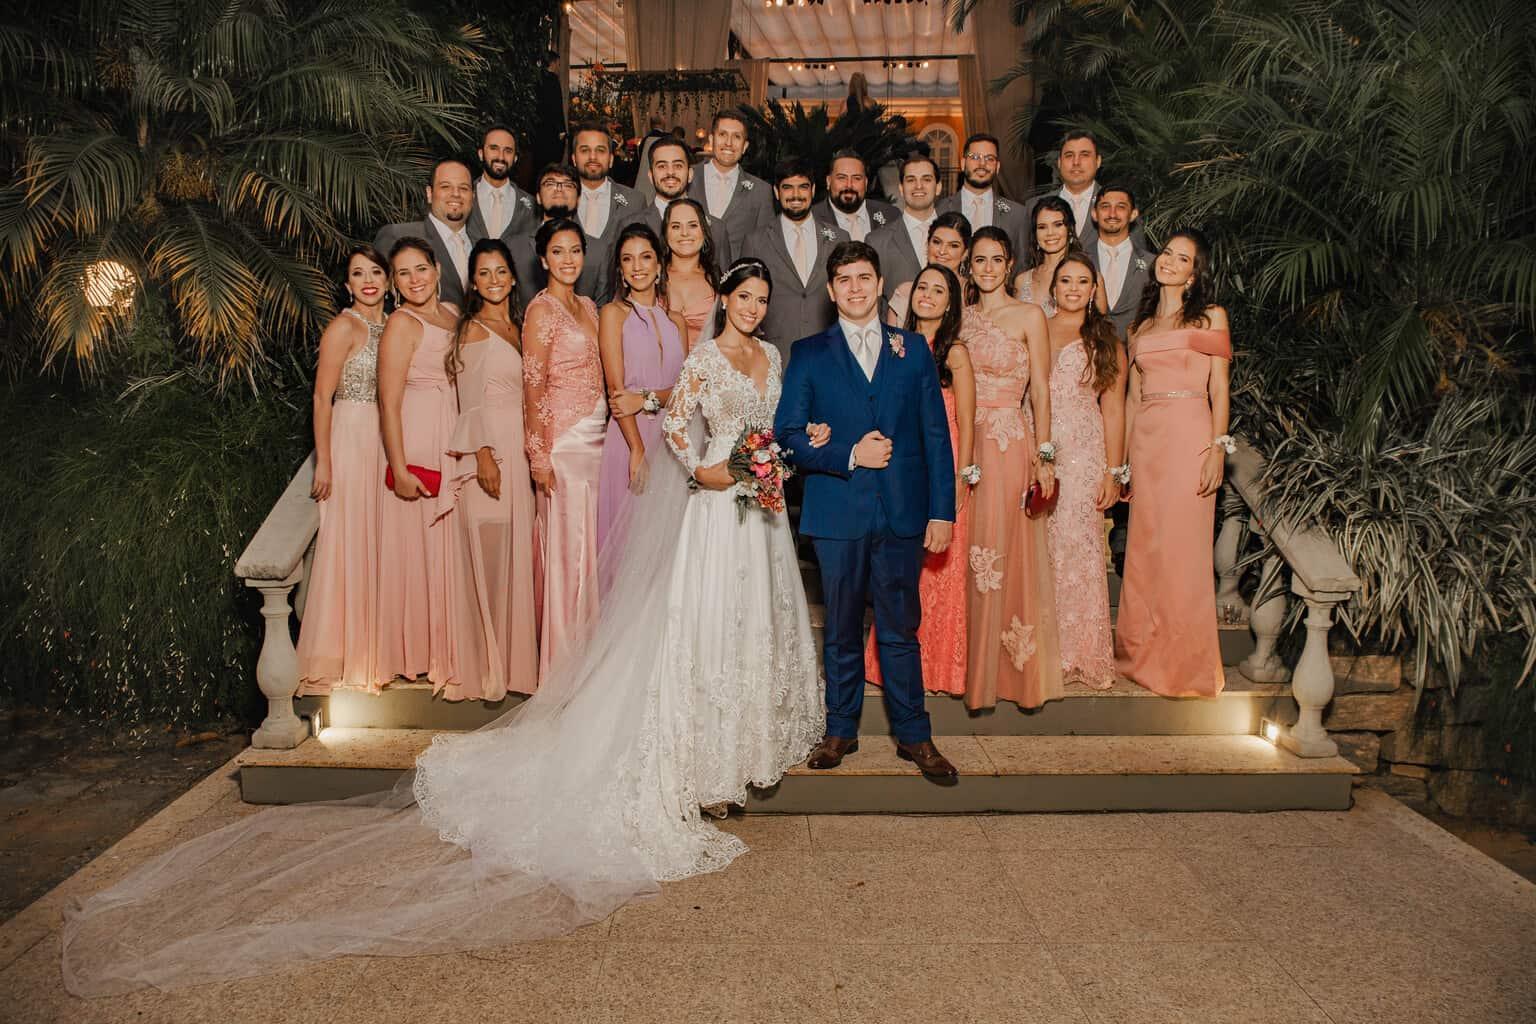 casamento-Beatriz-e-Joao-Fernando-Itaipava-Locanda-Della-Mimosa-padrinhos-Thienny-Tammis183